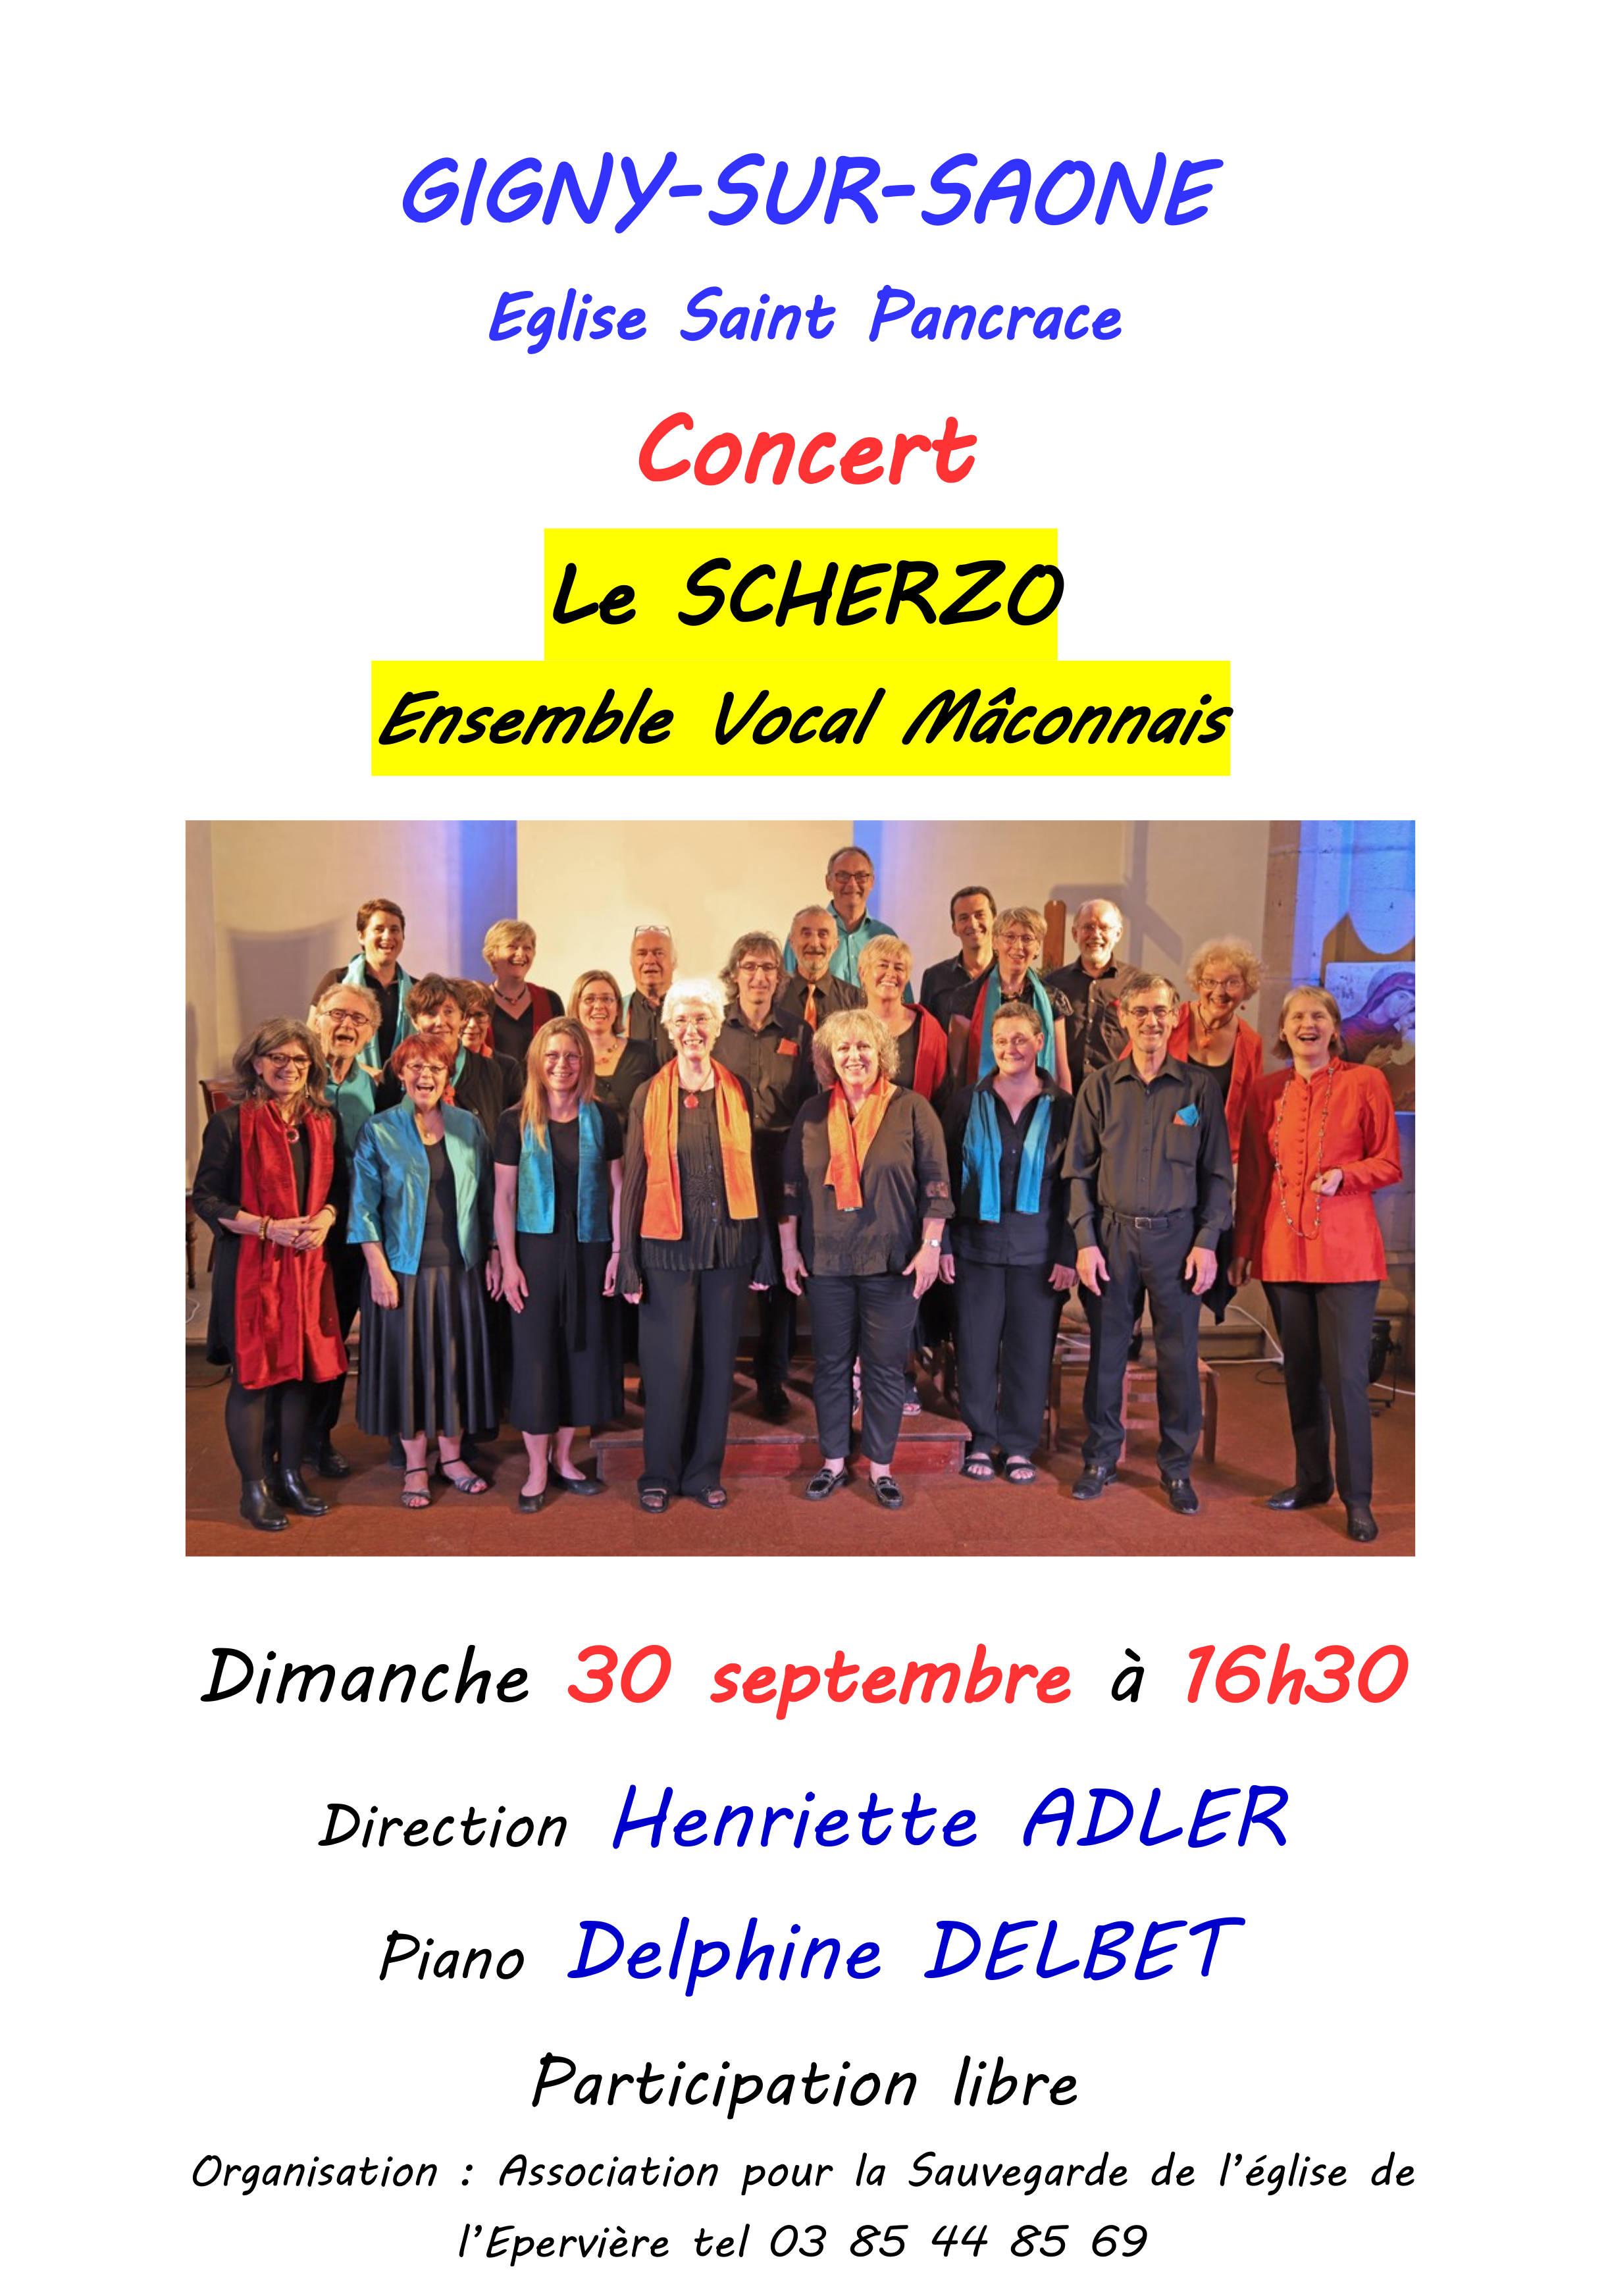 Concert à Gigny